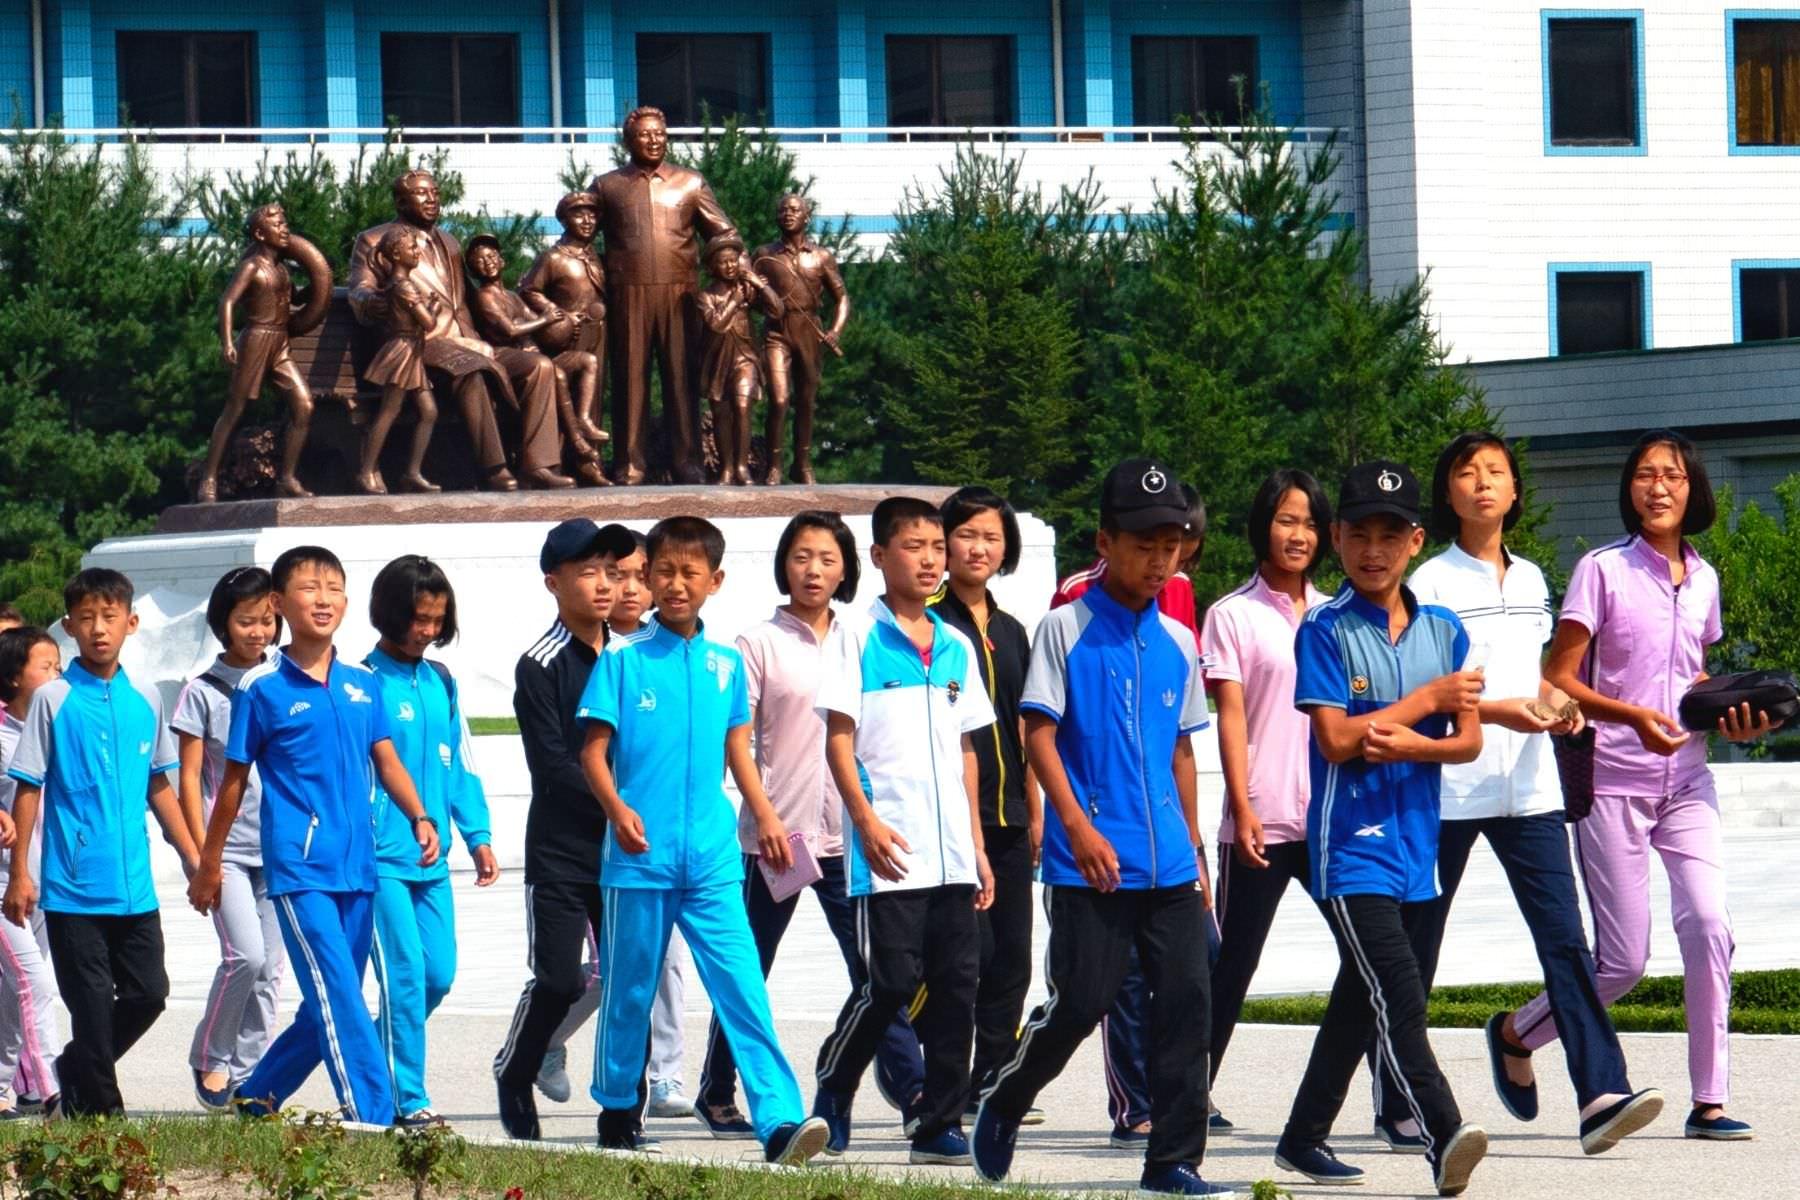 Songdowon Children's Camp in Wonsan, North Korea (DPRK) with KTG Tours